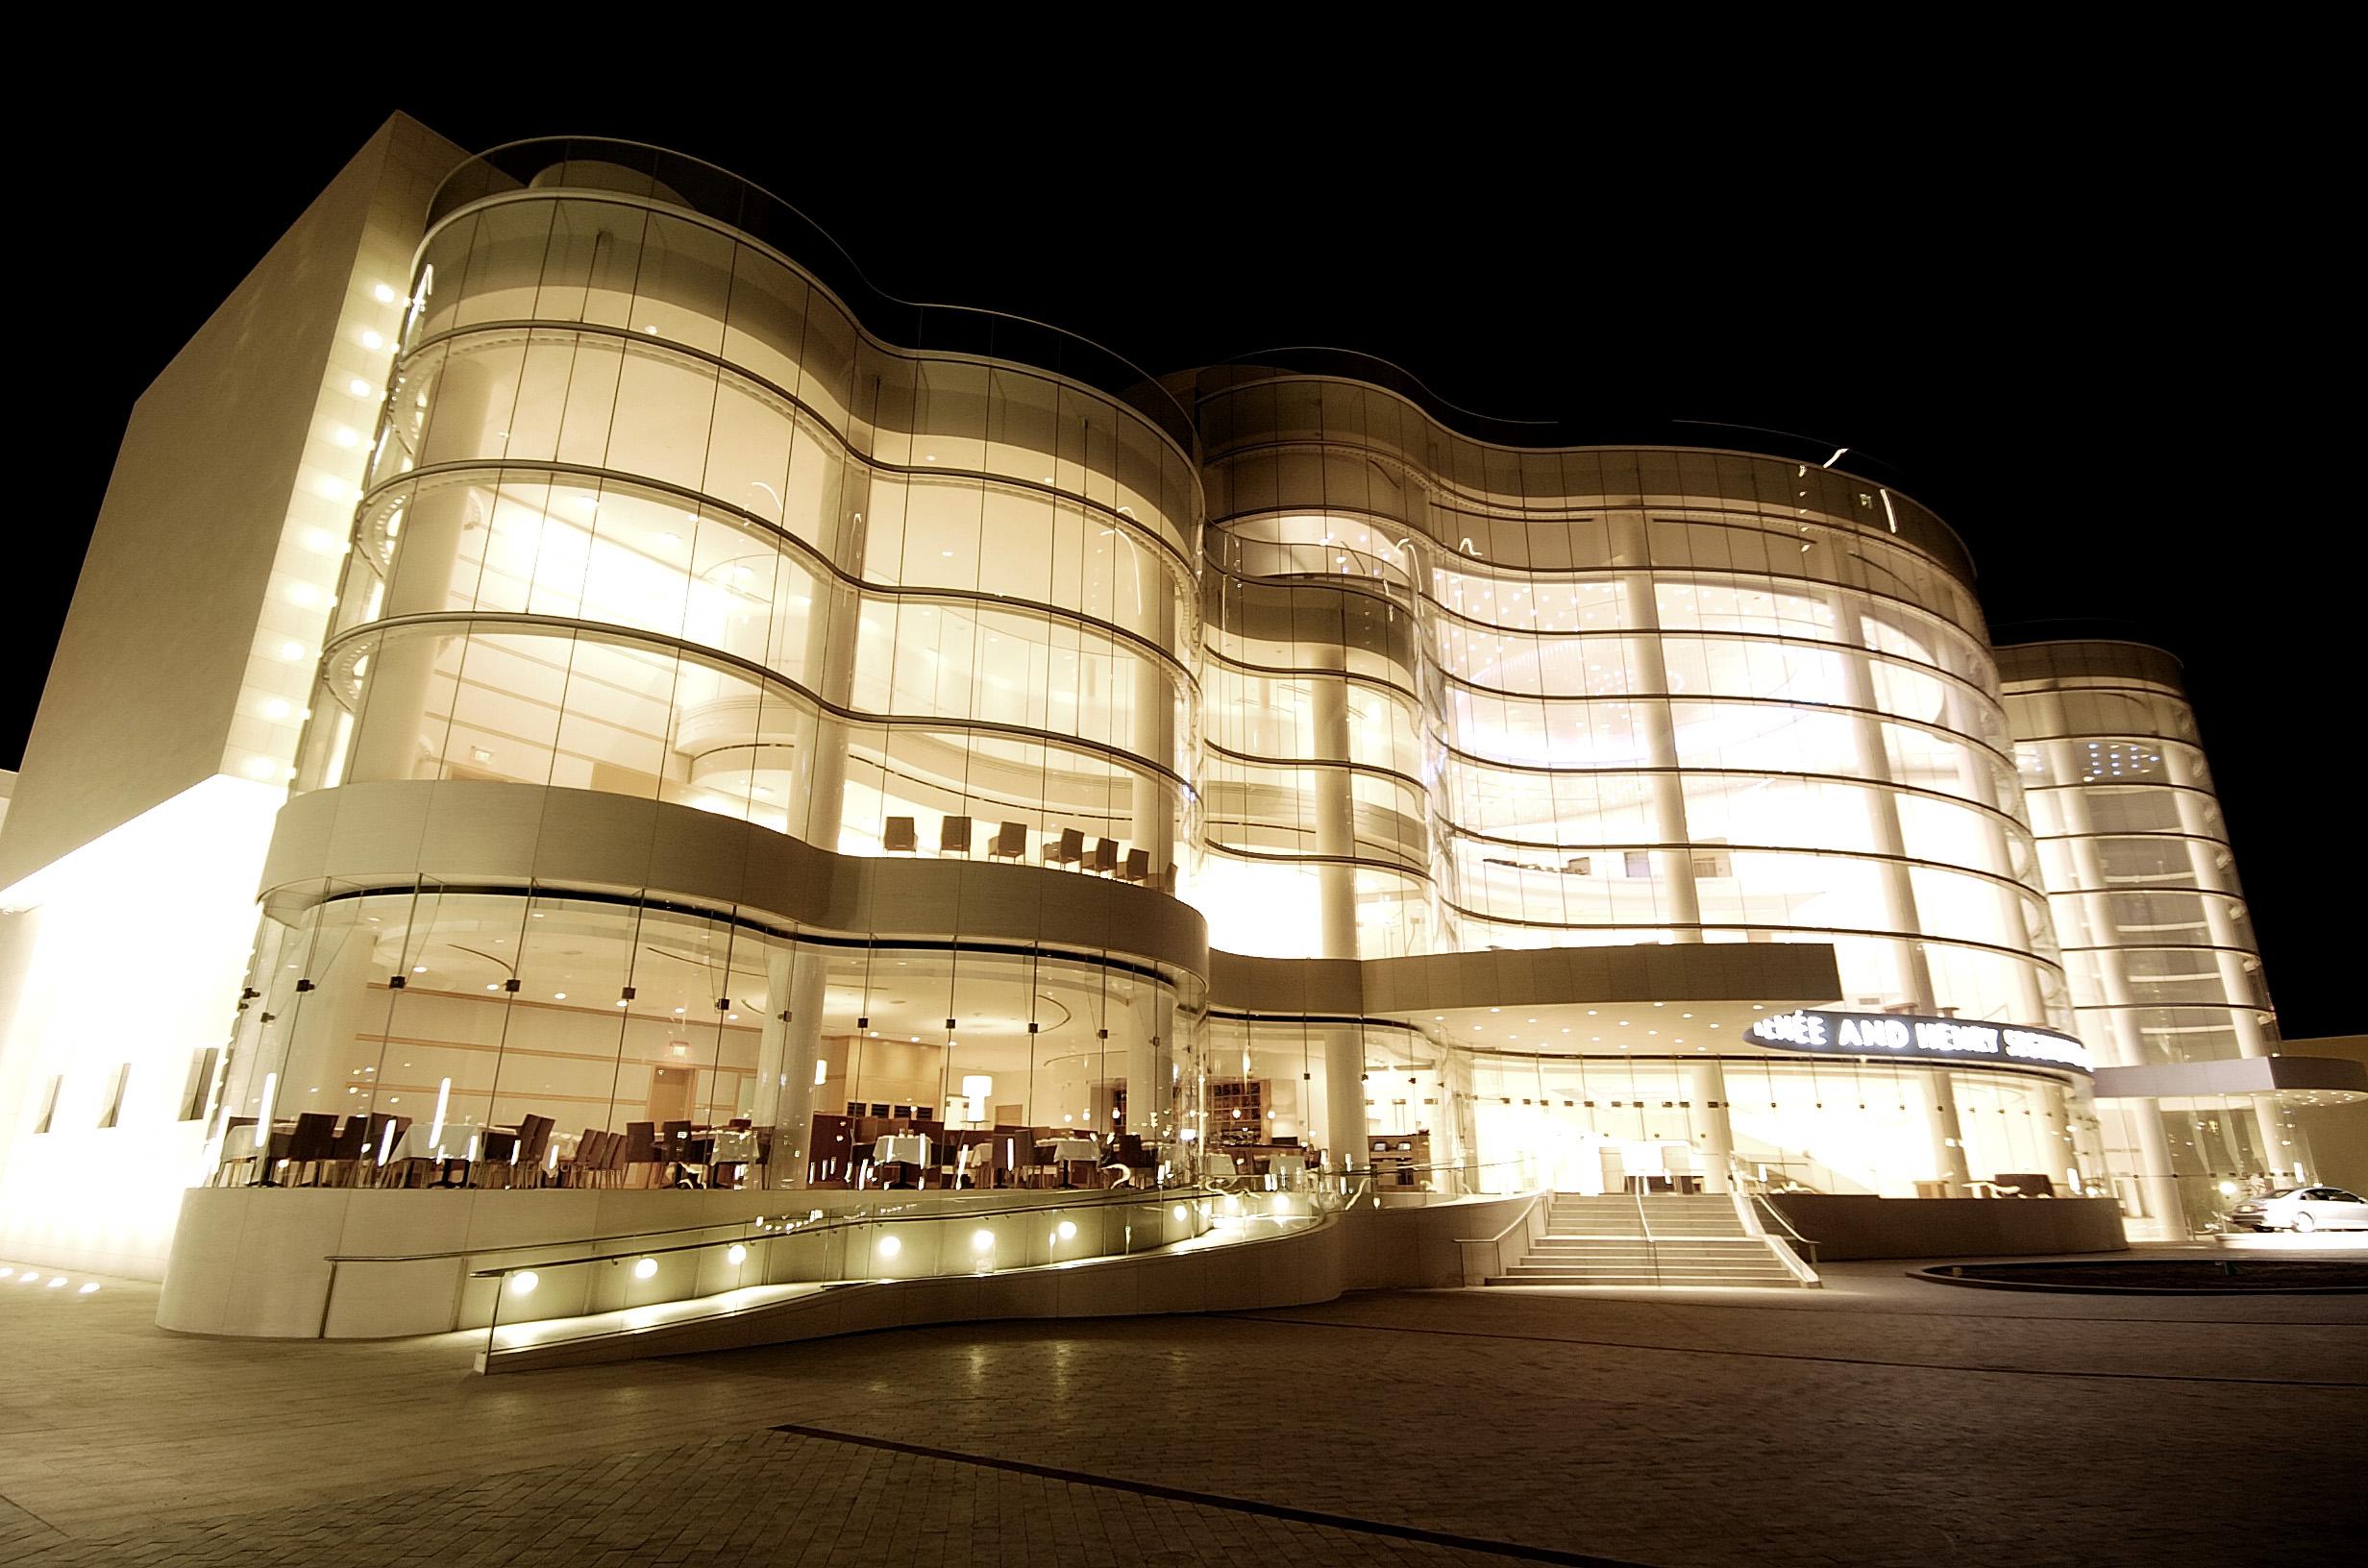 File:OC-Performing-Arts-Center jpg - Wikimedia Commons